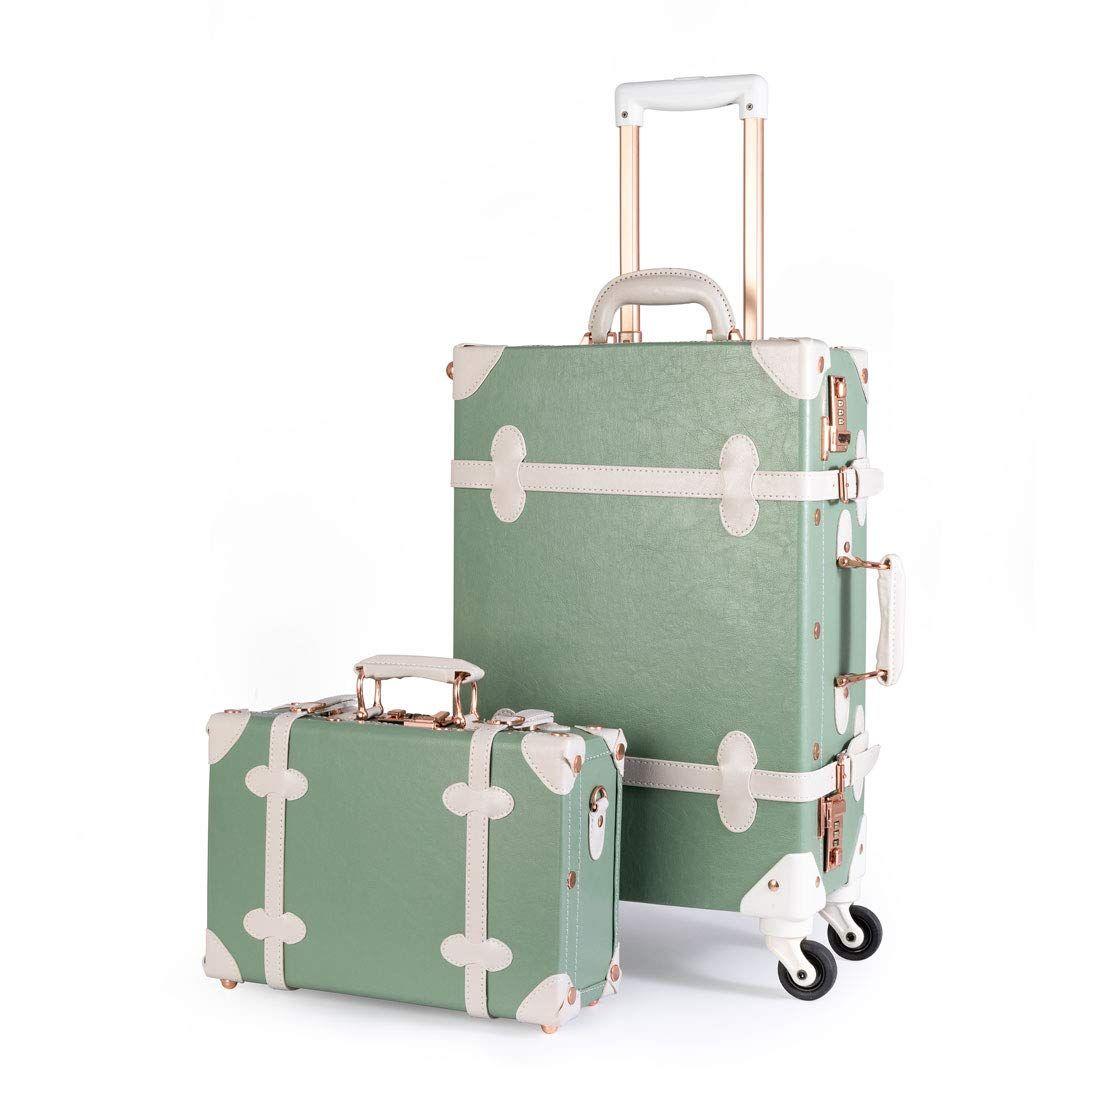 8b7834e6ae57 Amazon.com: UNIWALKER Pu Leather Vintage Luggage Set Carry On ...